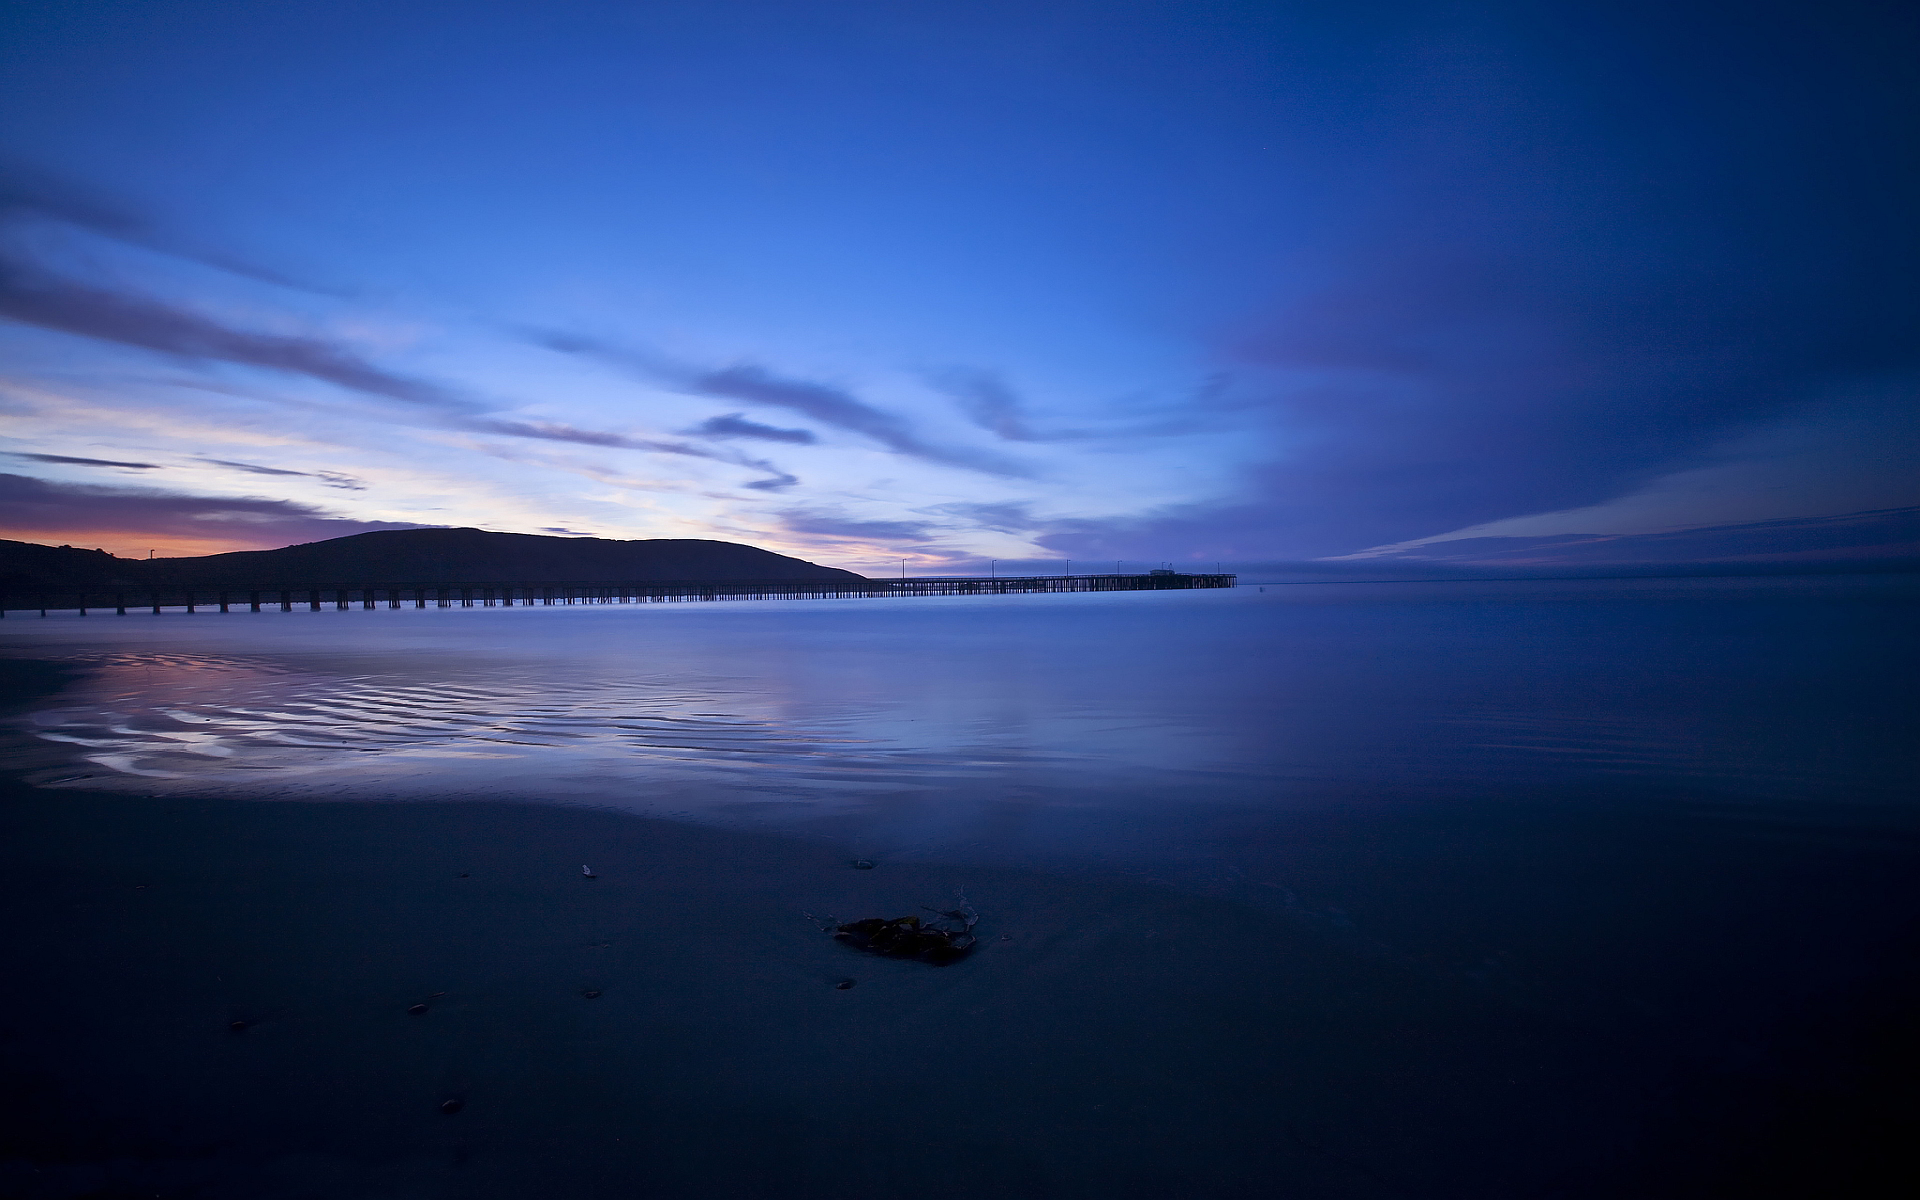 Pier sunset sky